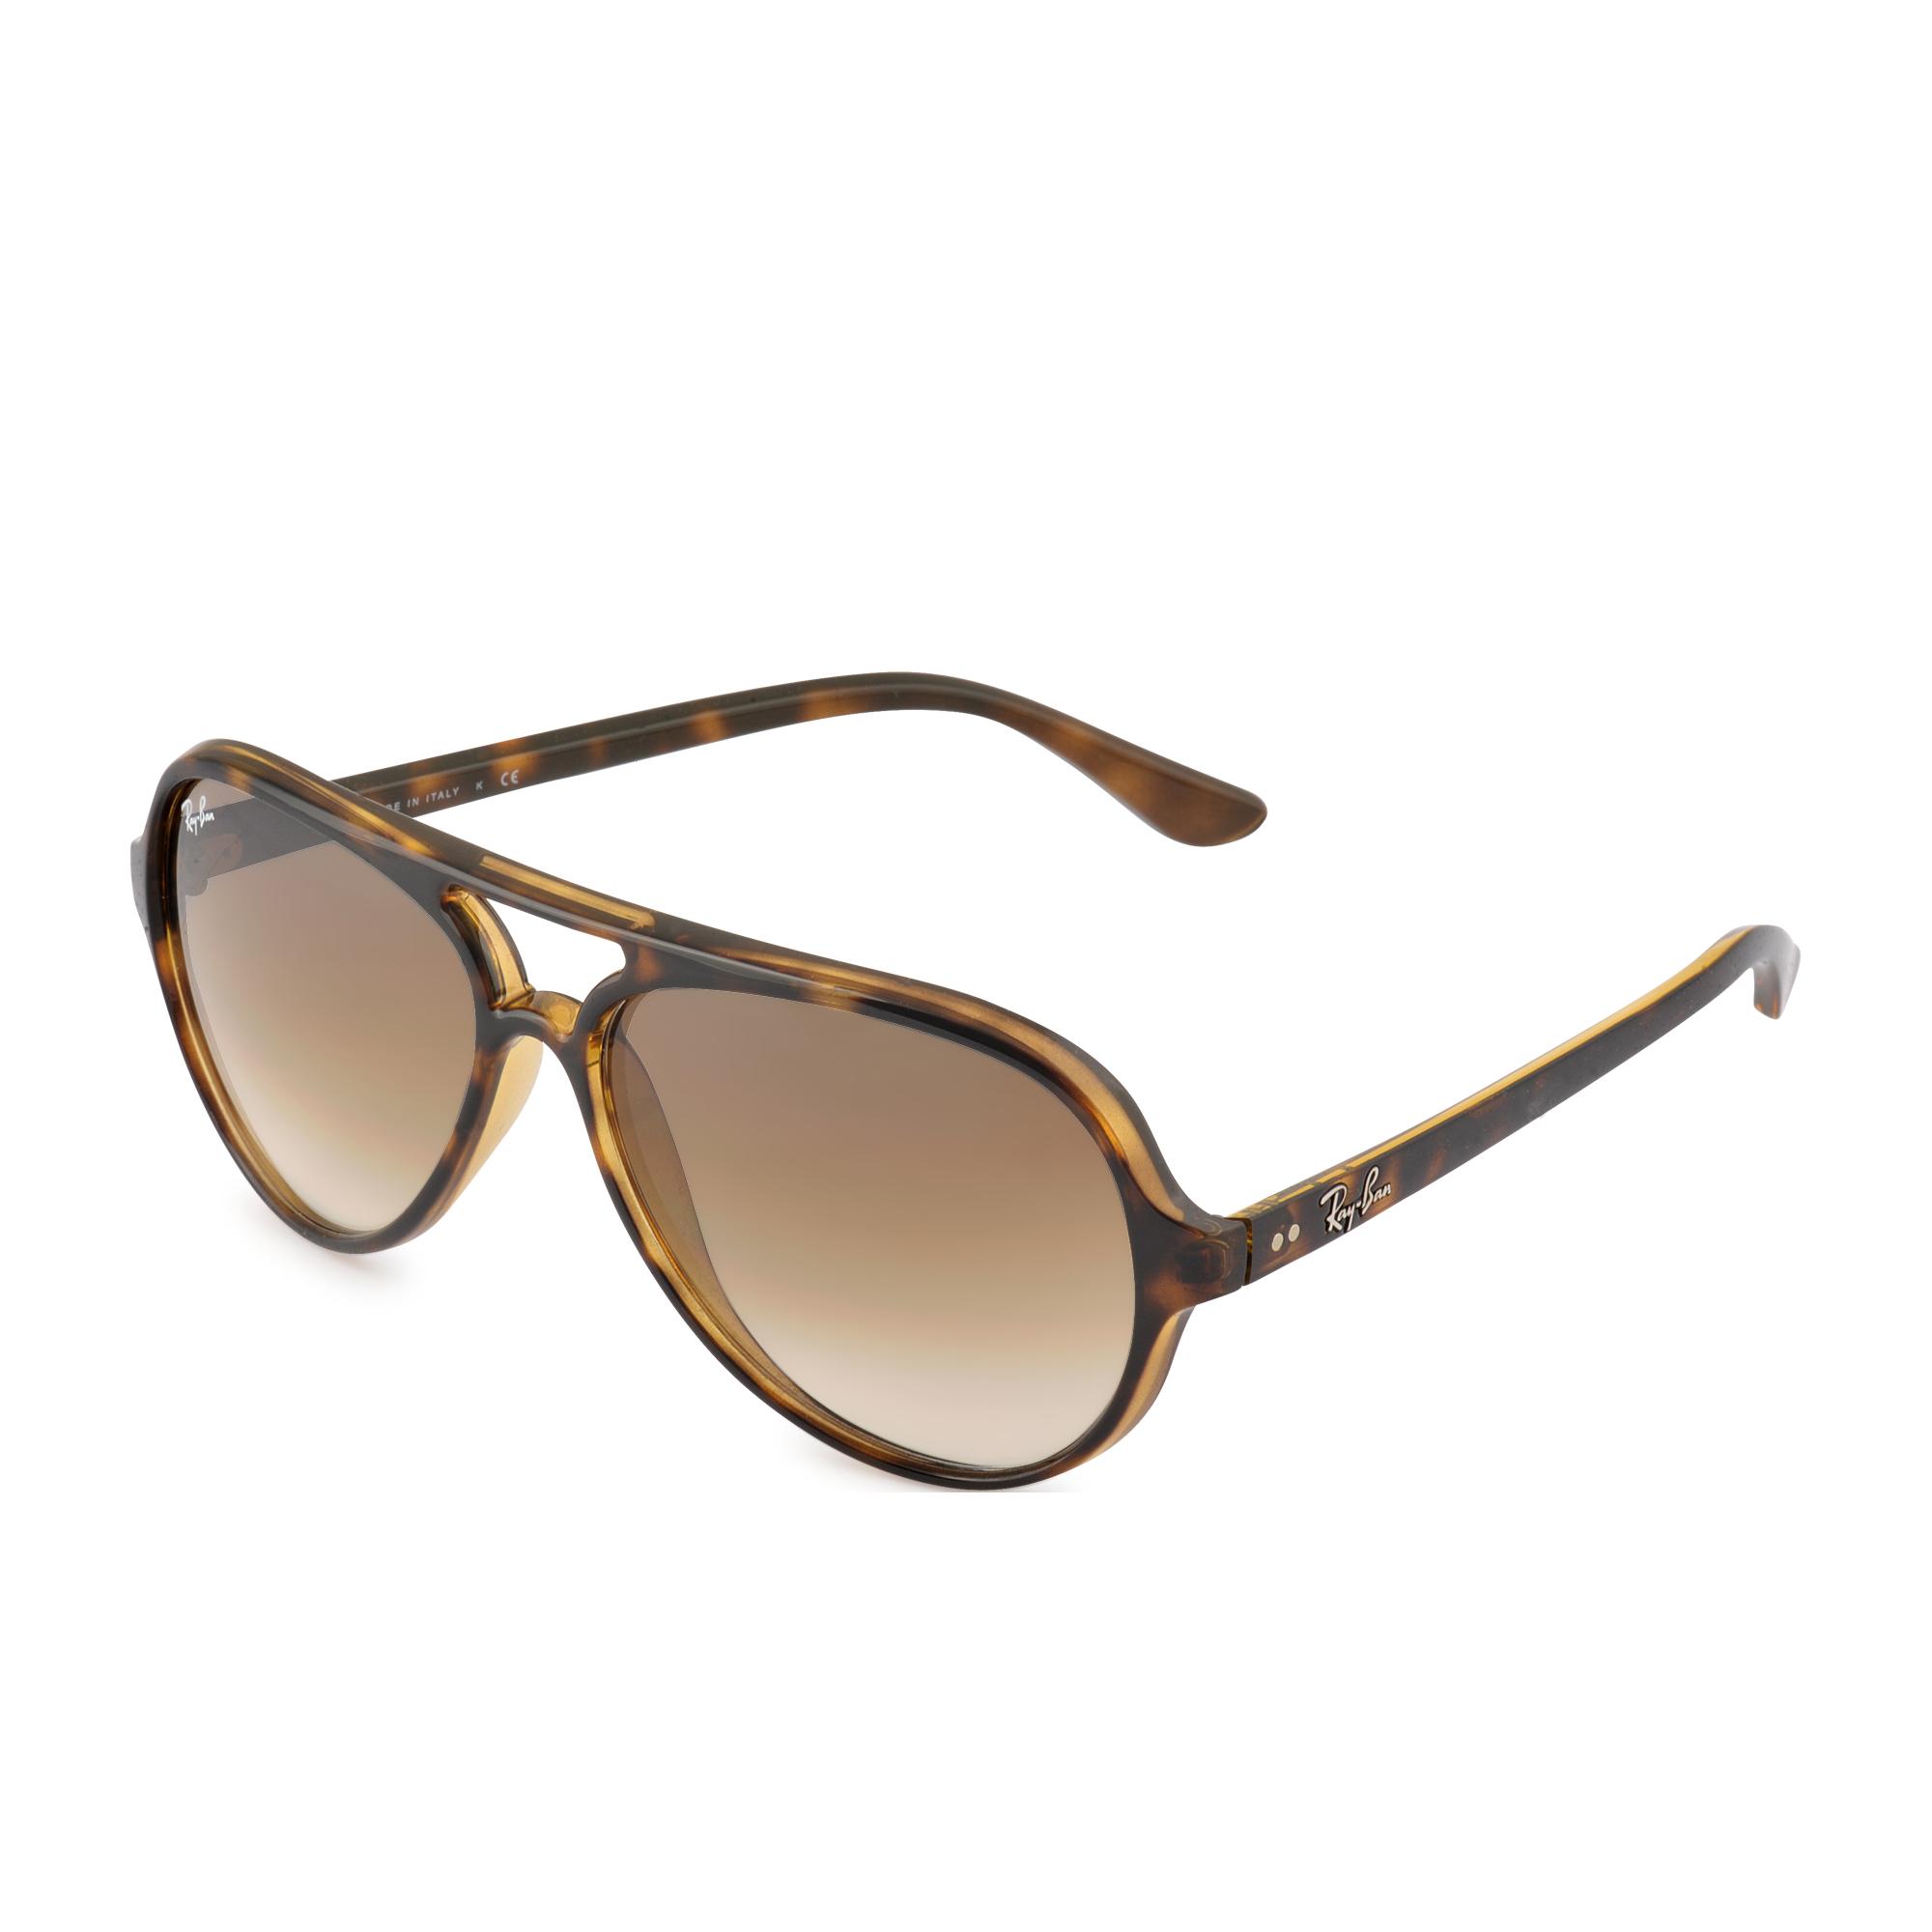 ray ban rb4105 folding wayfarer  ray ban rb4057 sunglasses glossy black frame crystal green lens